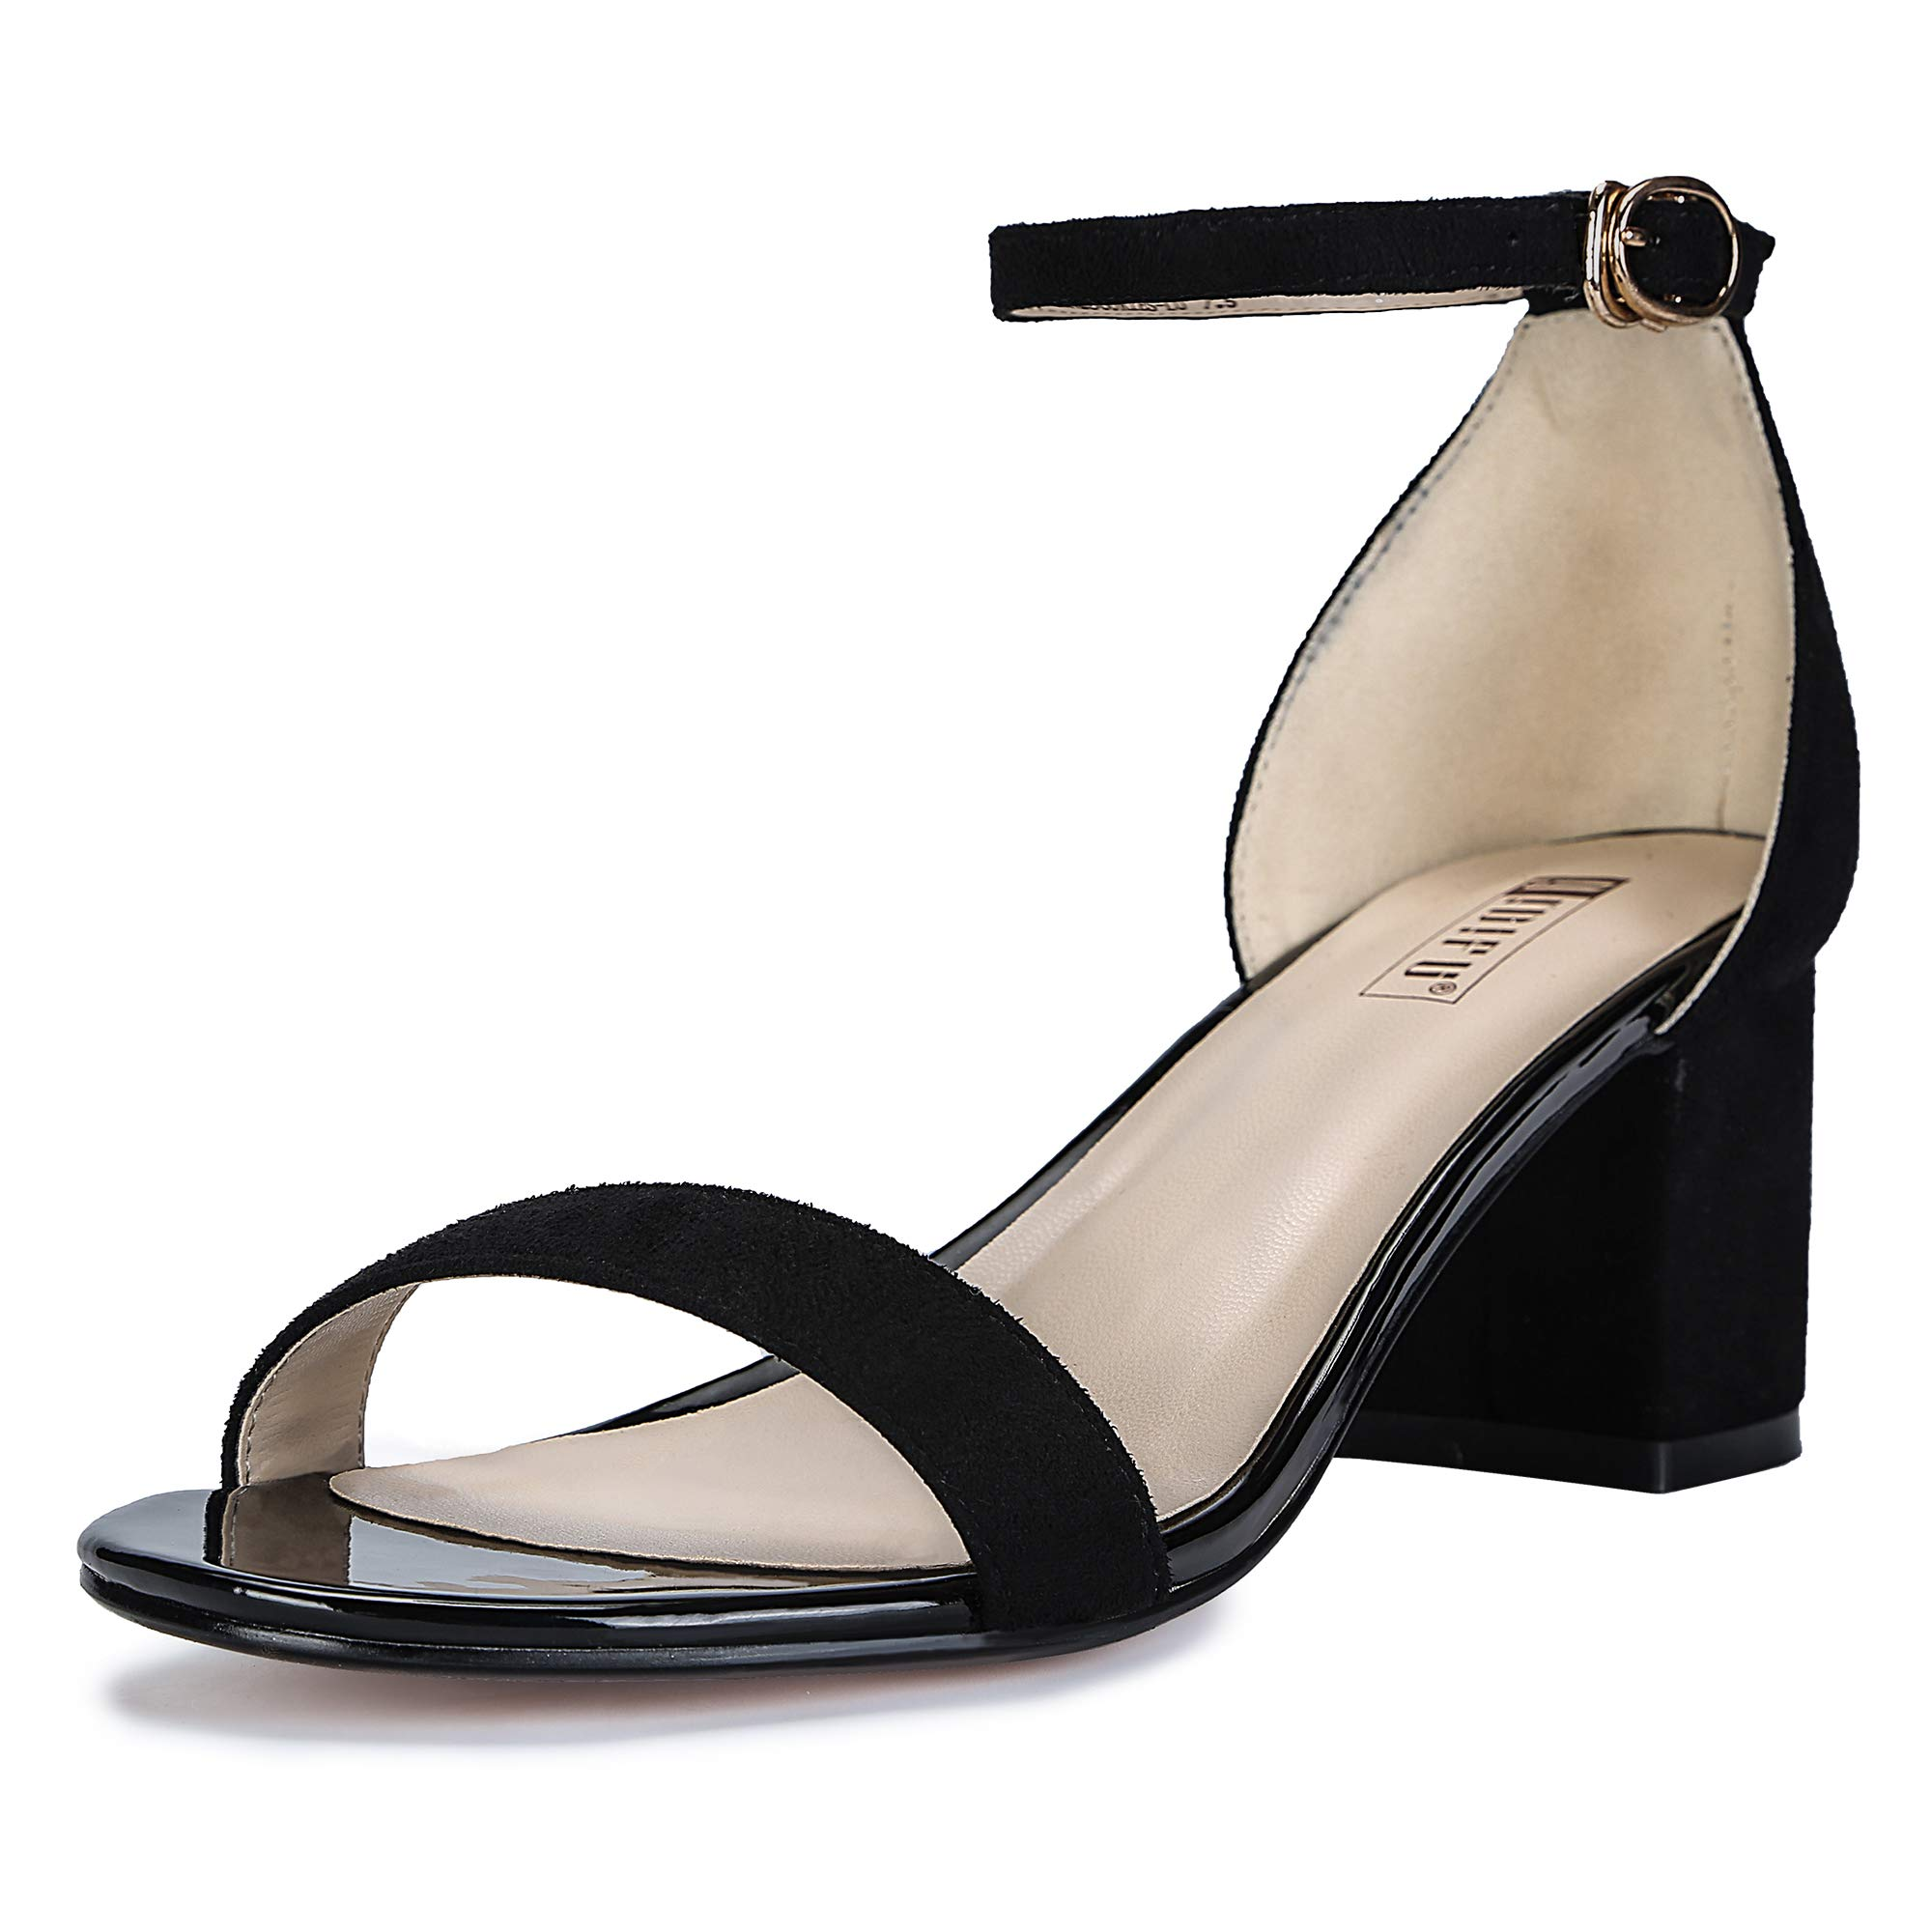 IDIFU Women's IN2 Cookie-LO Low Heel Ankle Strap Dress Pump Sandal (Black Suede, 6.5 B(M) US) by IDIFU